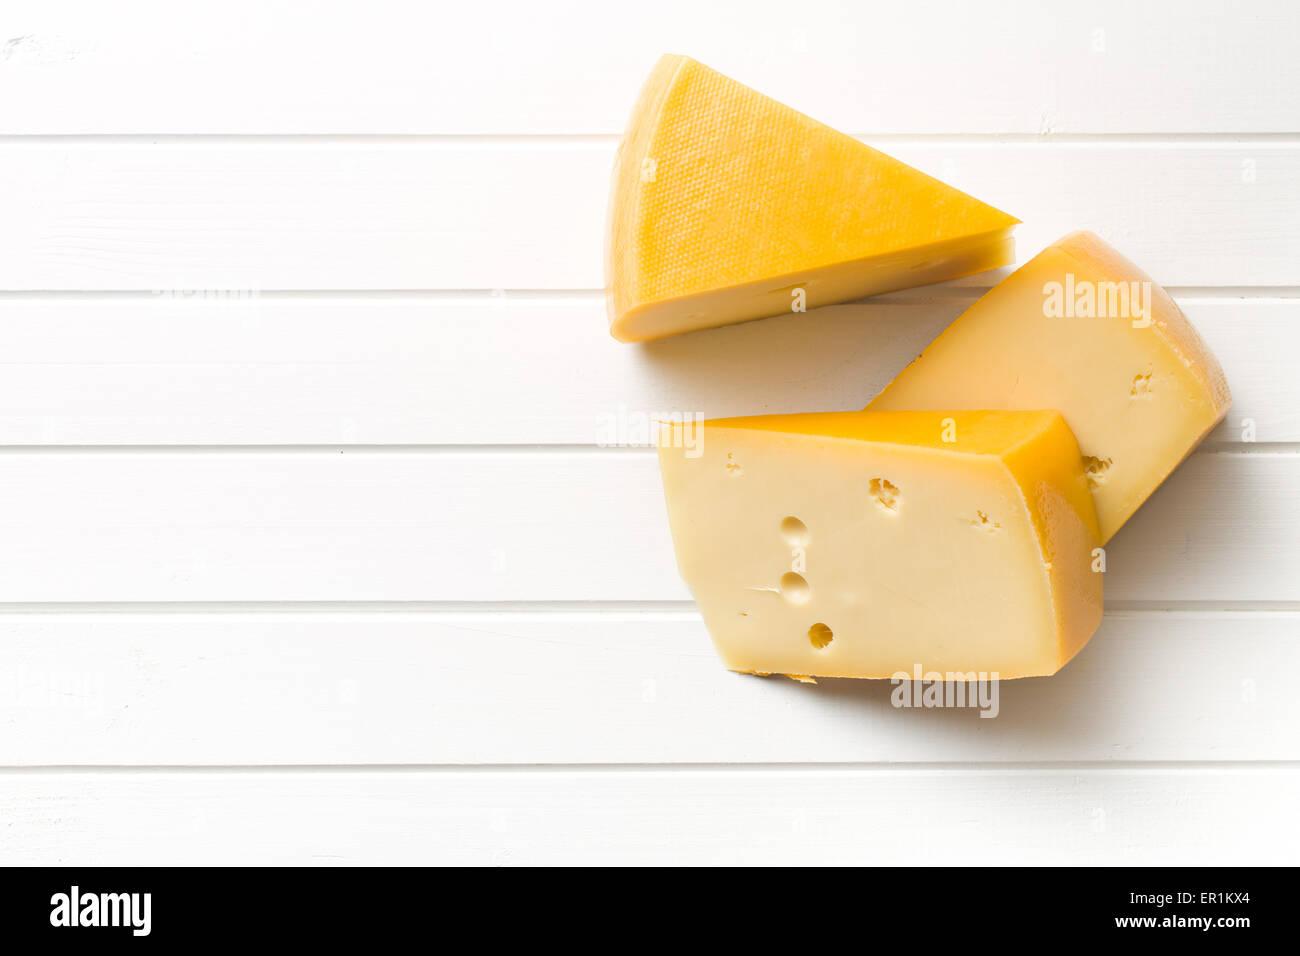 Vue de dessus de fromage Edam Photo Stock